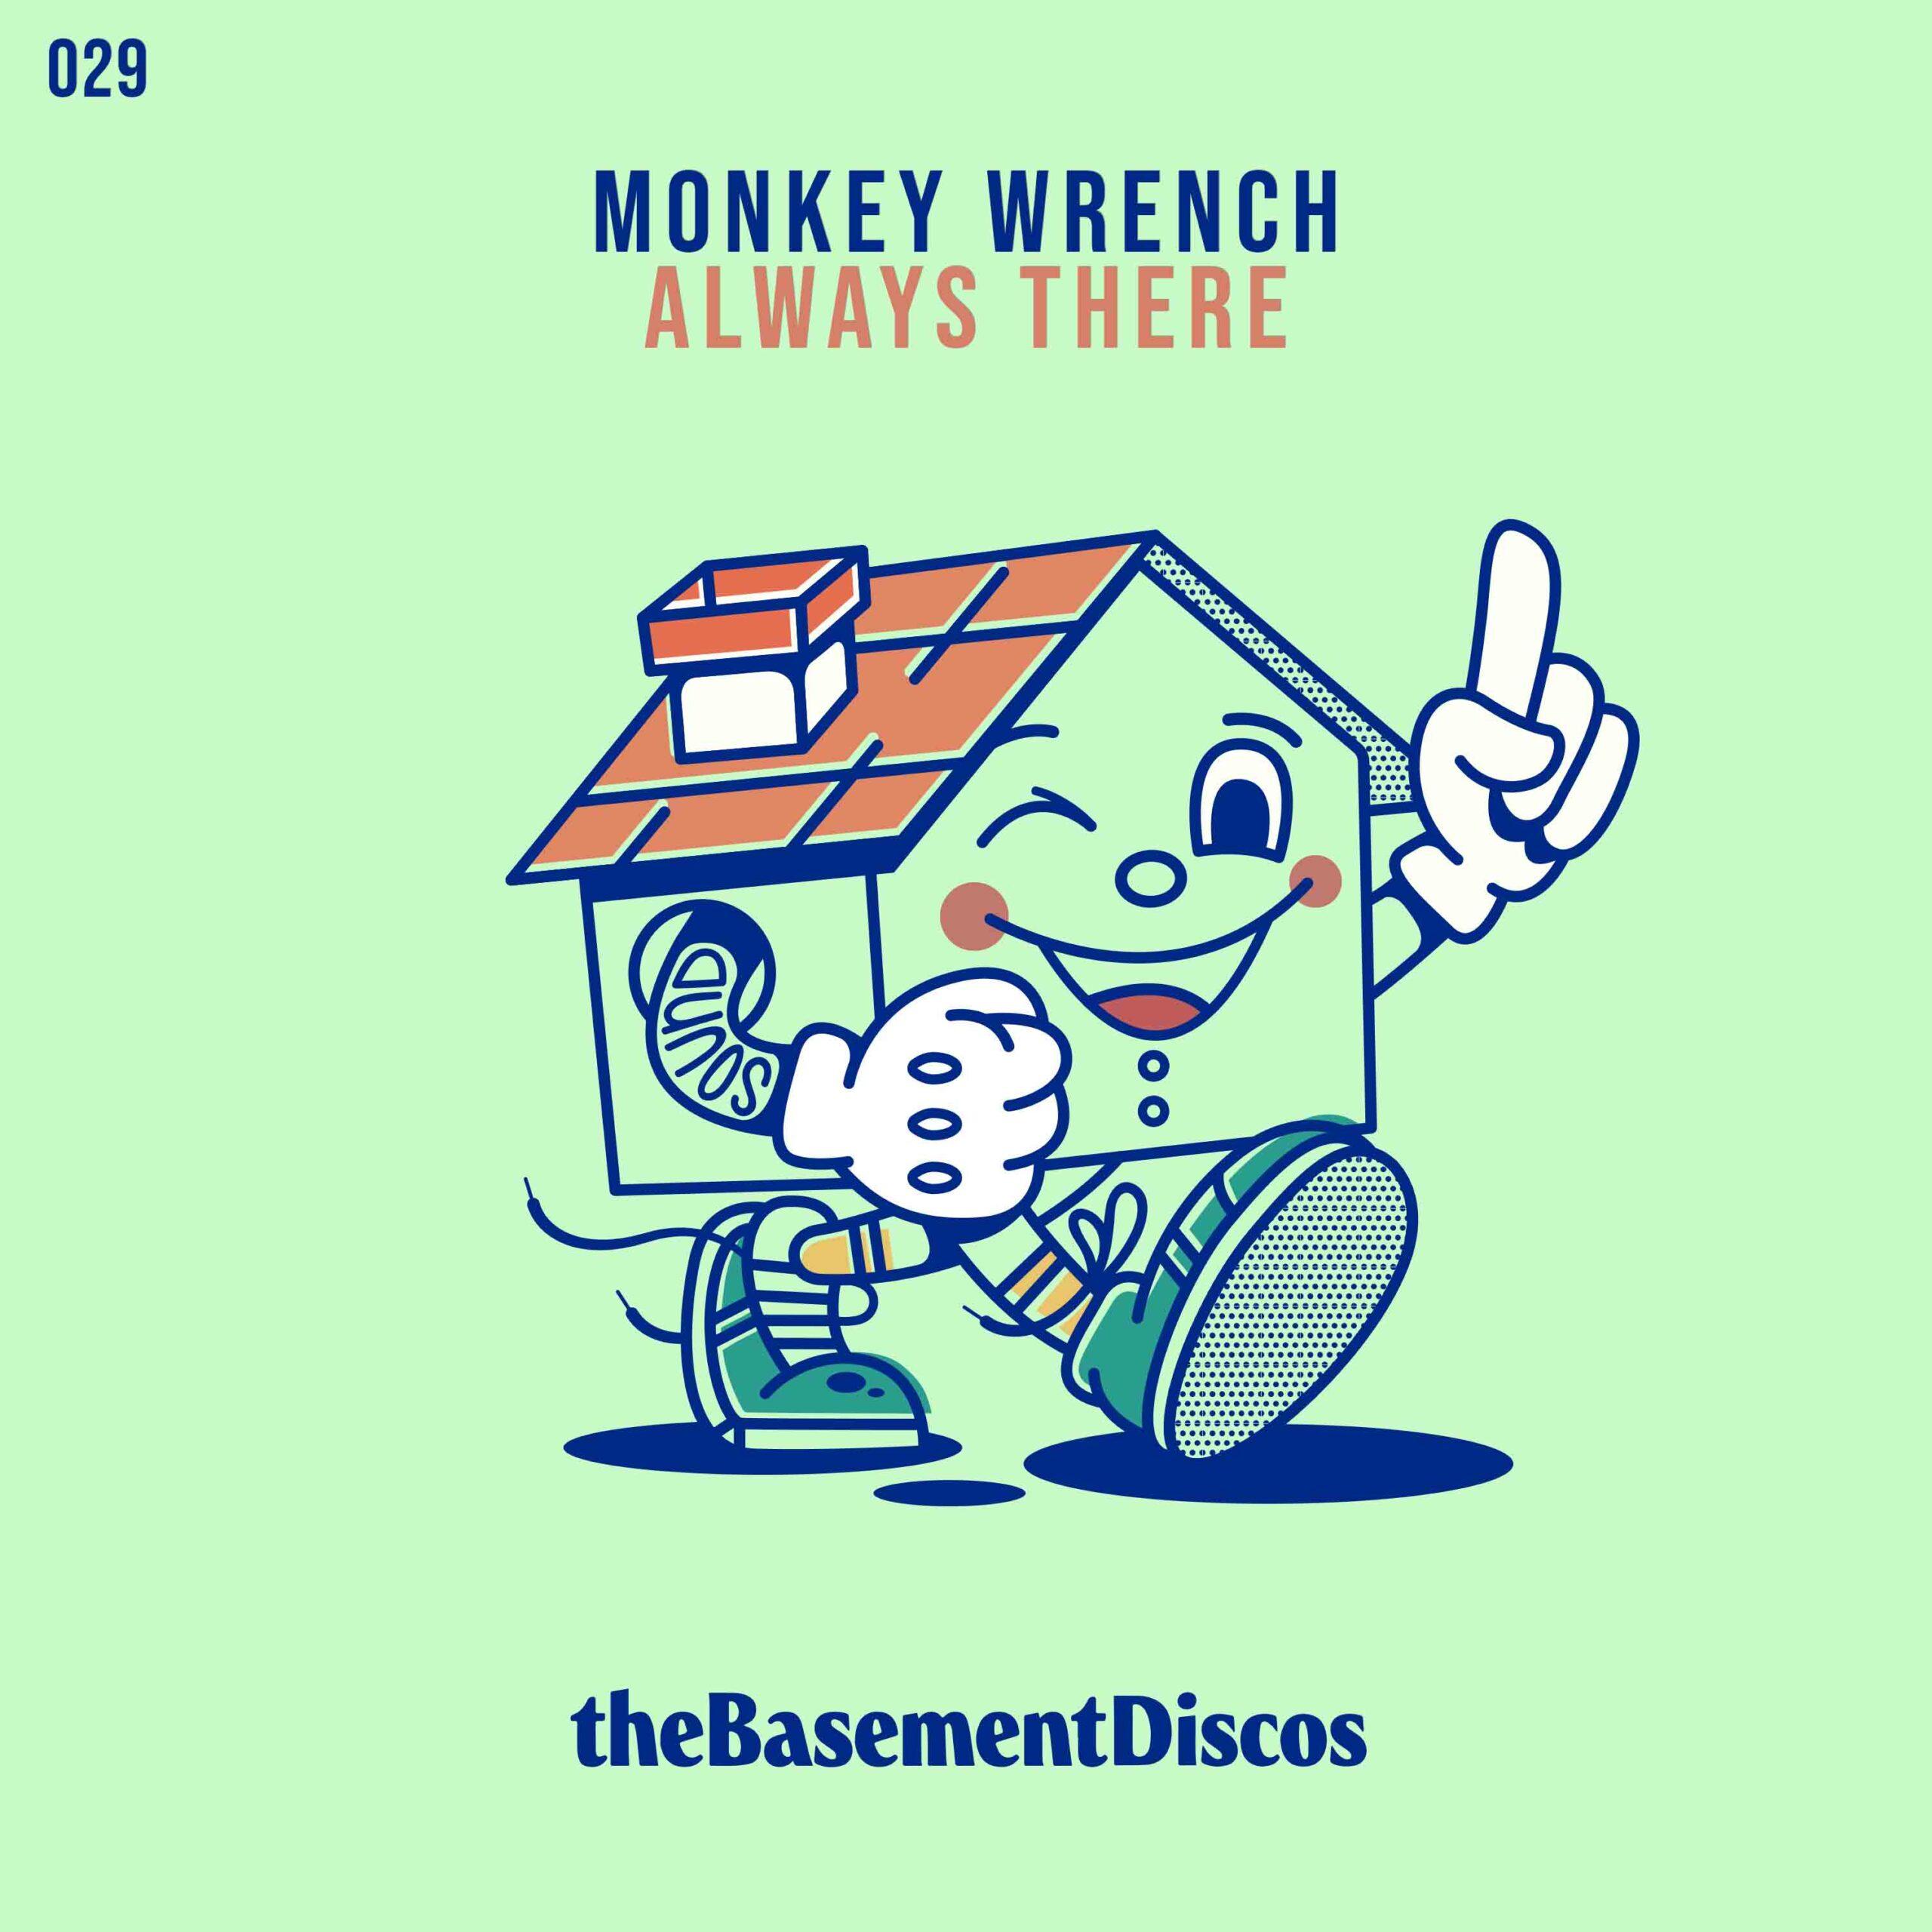 the-basement-thebasement-thebasementdiscos-monkey-wrench-always-there-valencia-dj-disco-house-good-feelings-portada